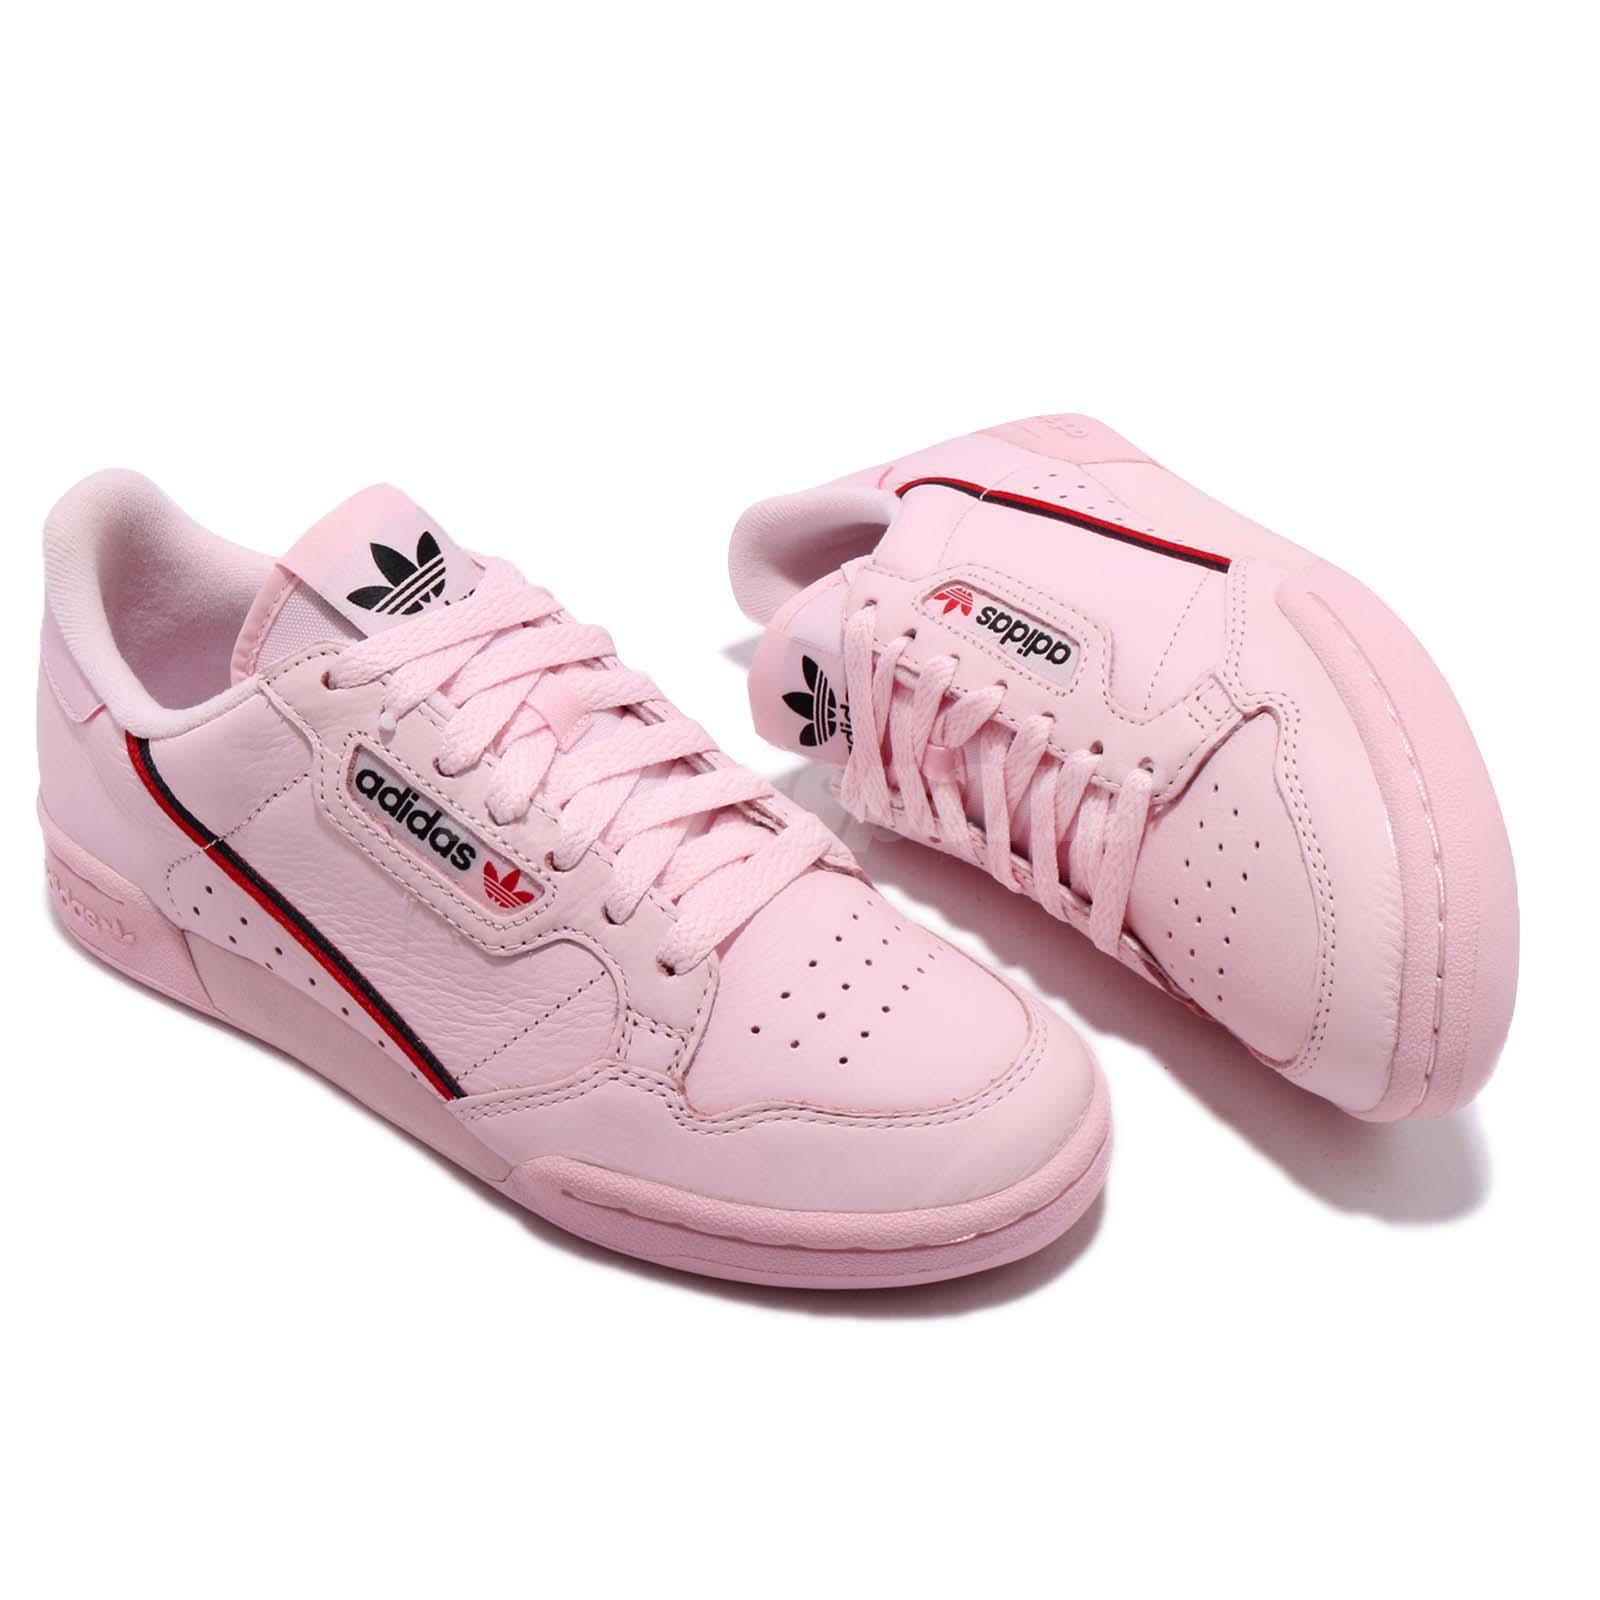 Adidas Originals Continental 80 Pink Lifestyle Sneakers Men Classic